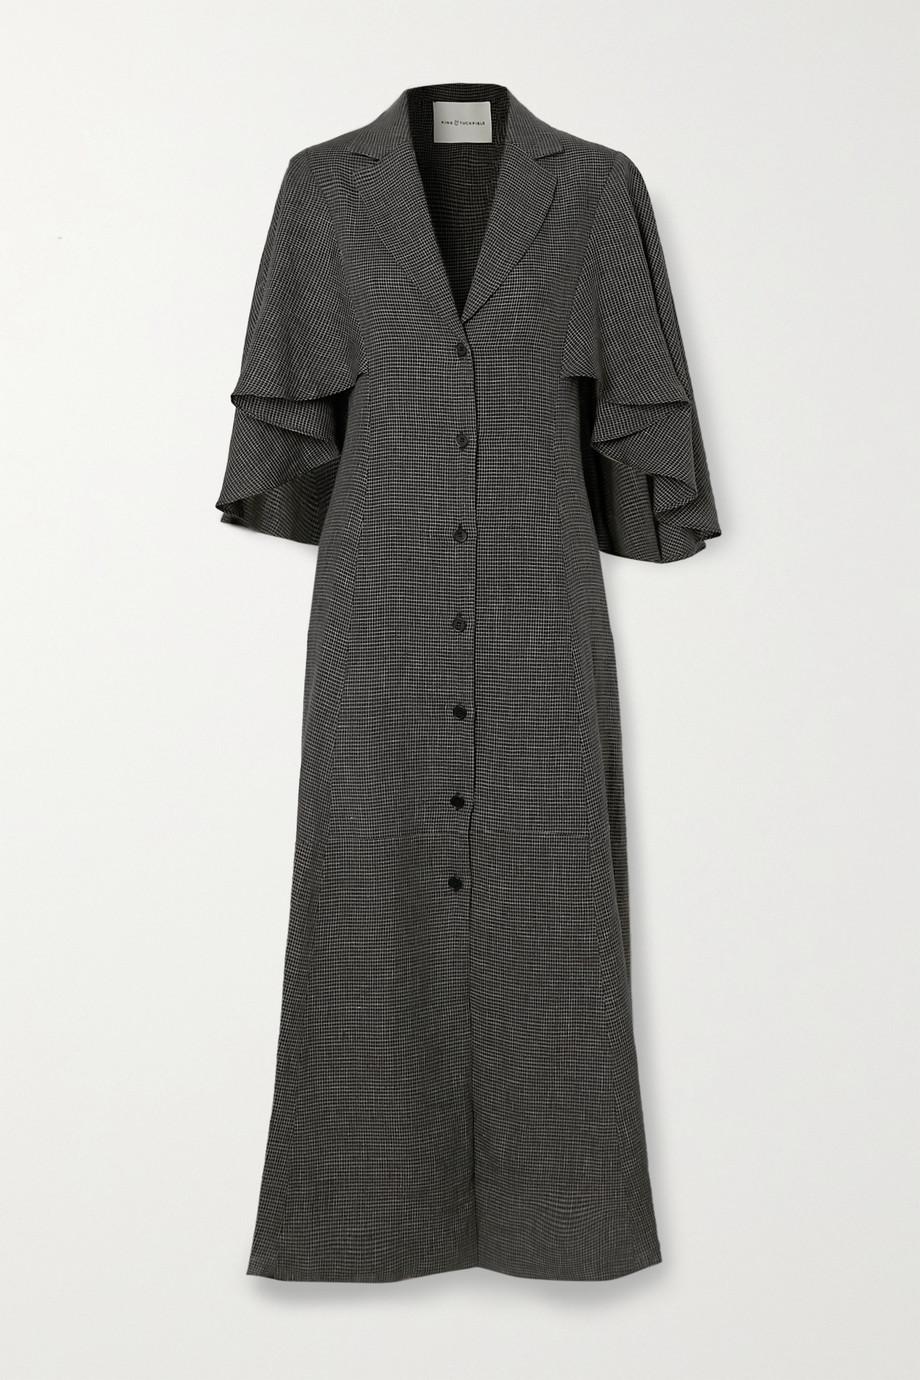 King & Tuckfield Waterfall checked linen midi dress